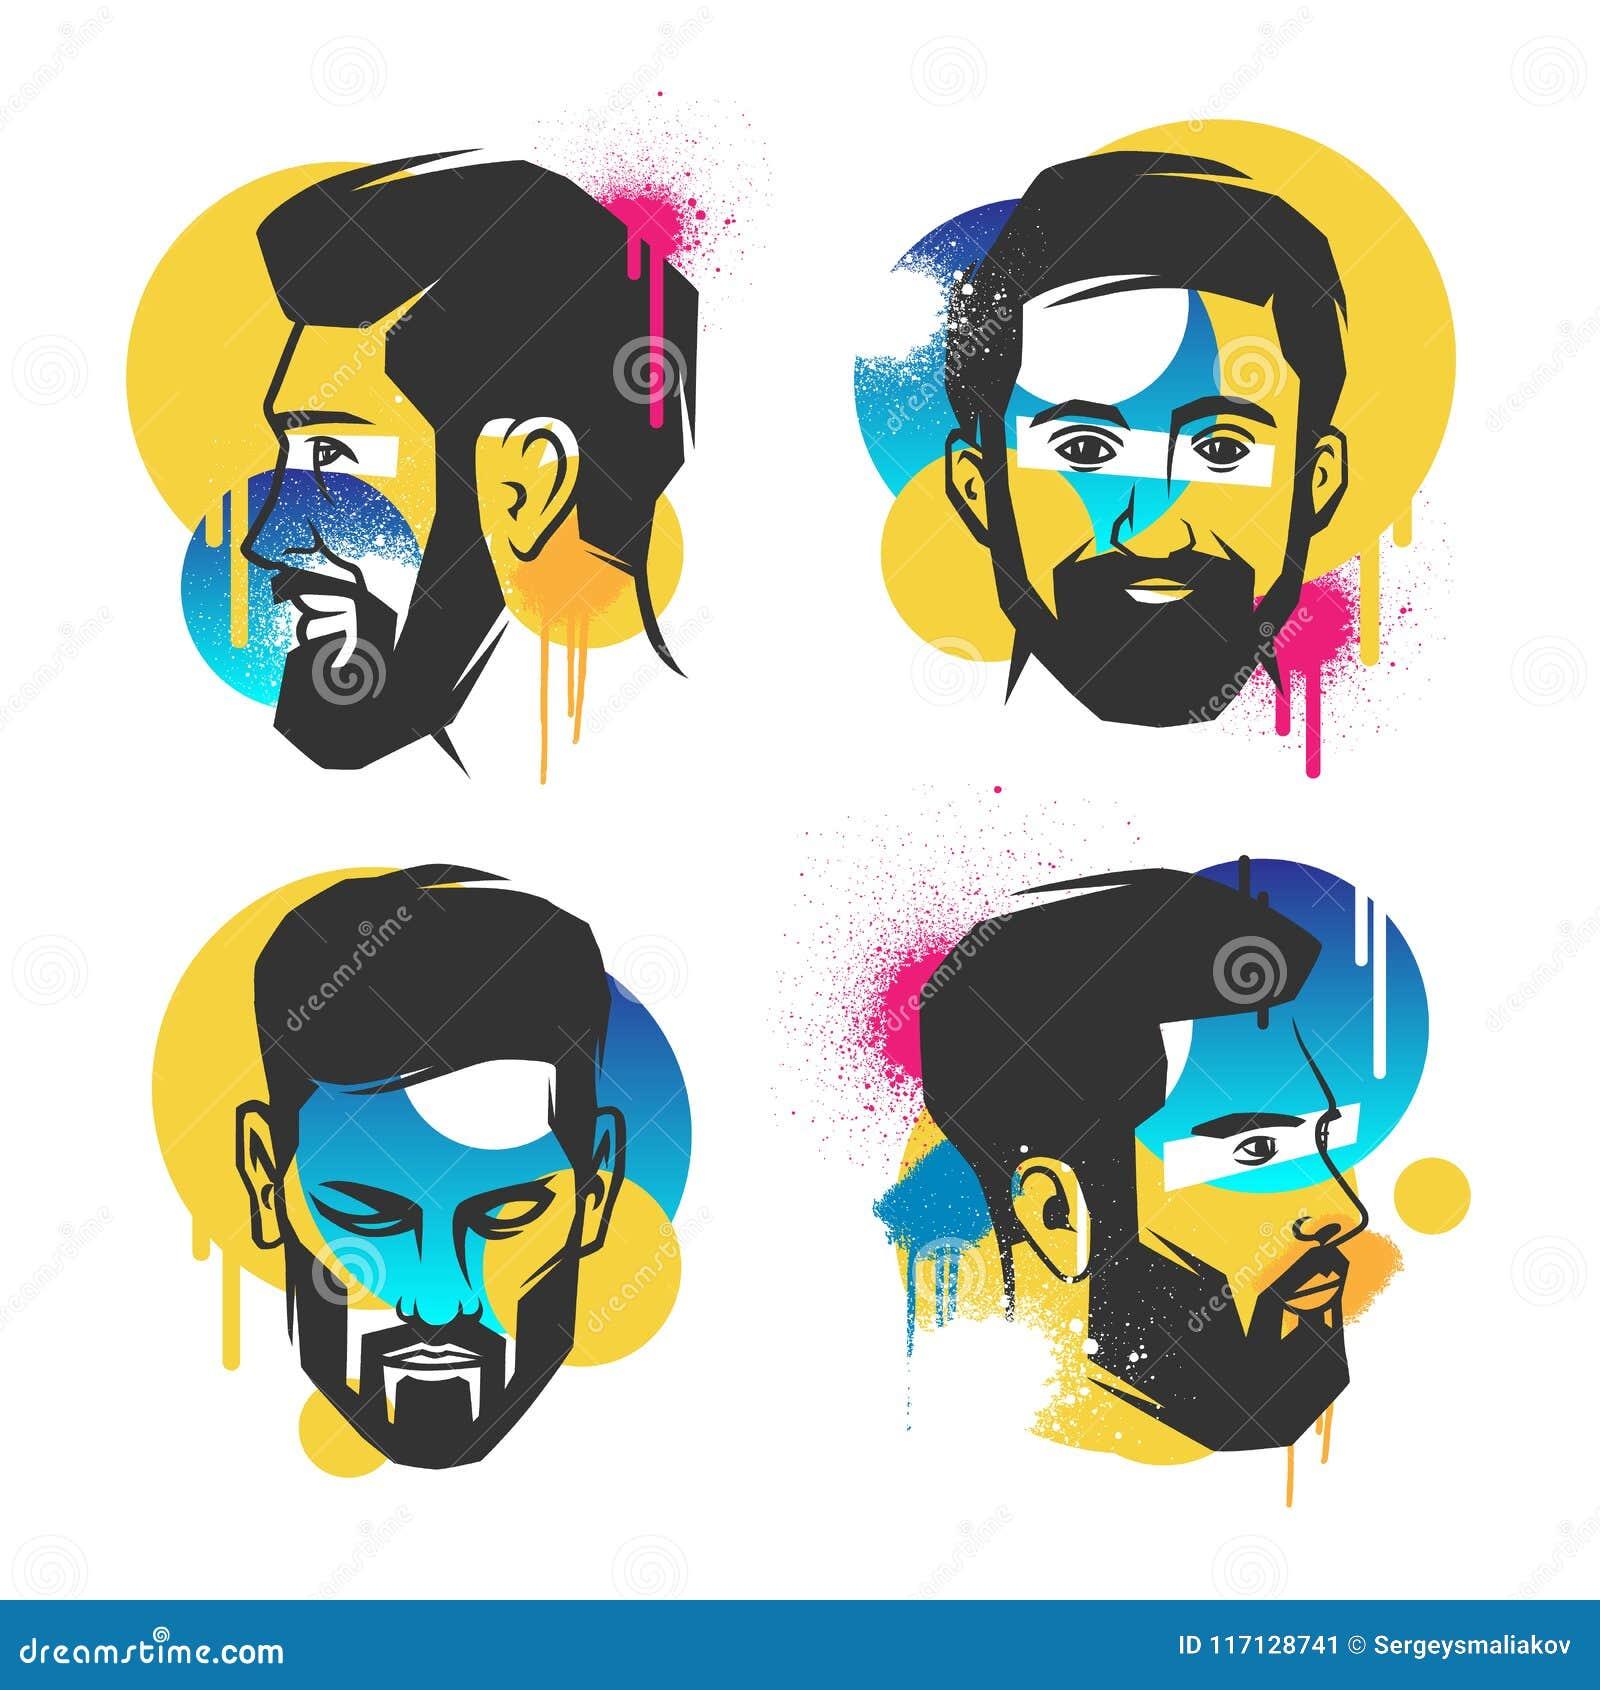 Creative concepts of a face.